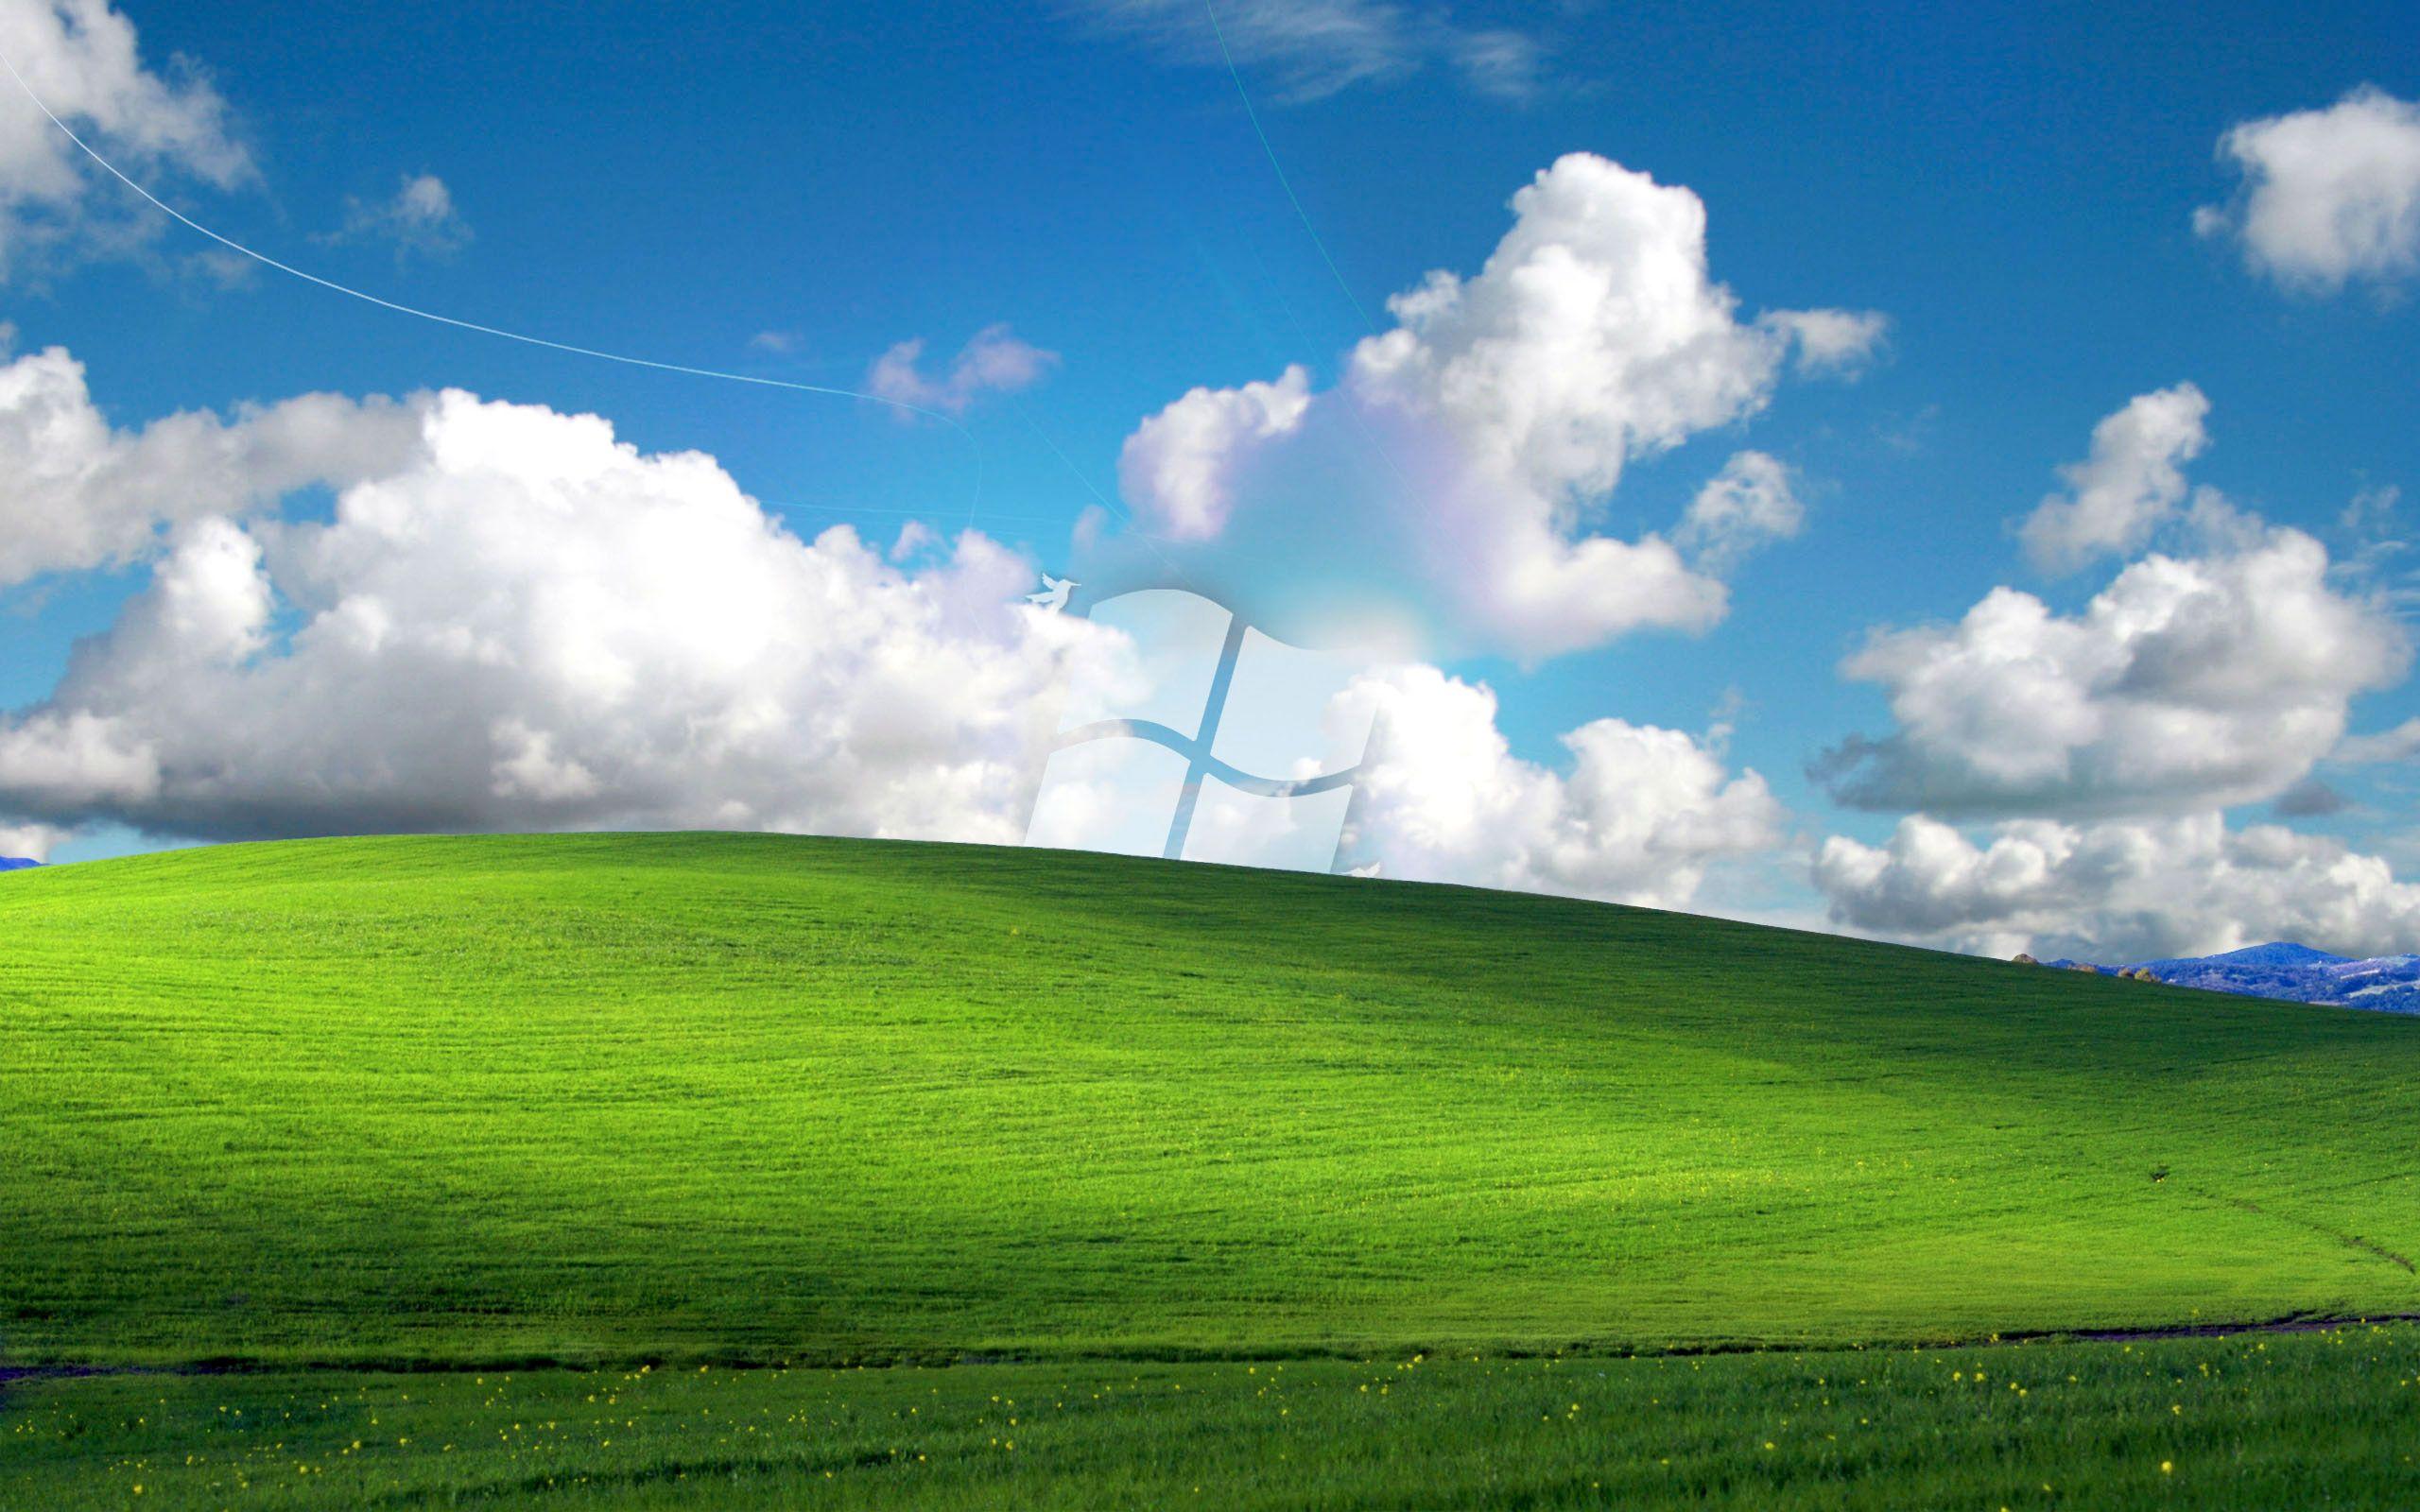 Windows XP Bliss Wallpaper Now - WallpaperSafari